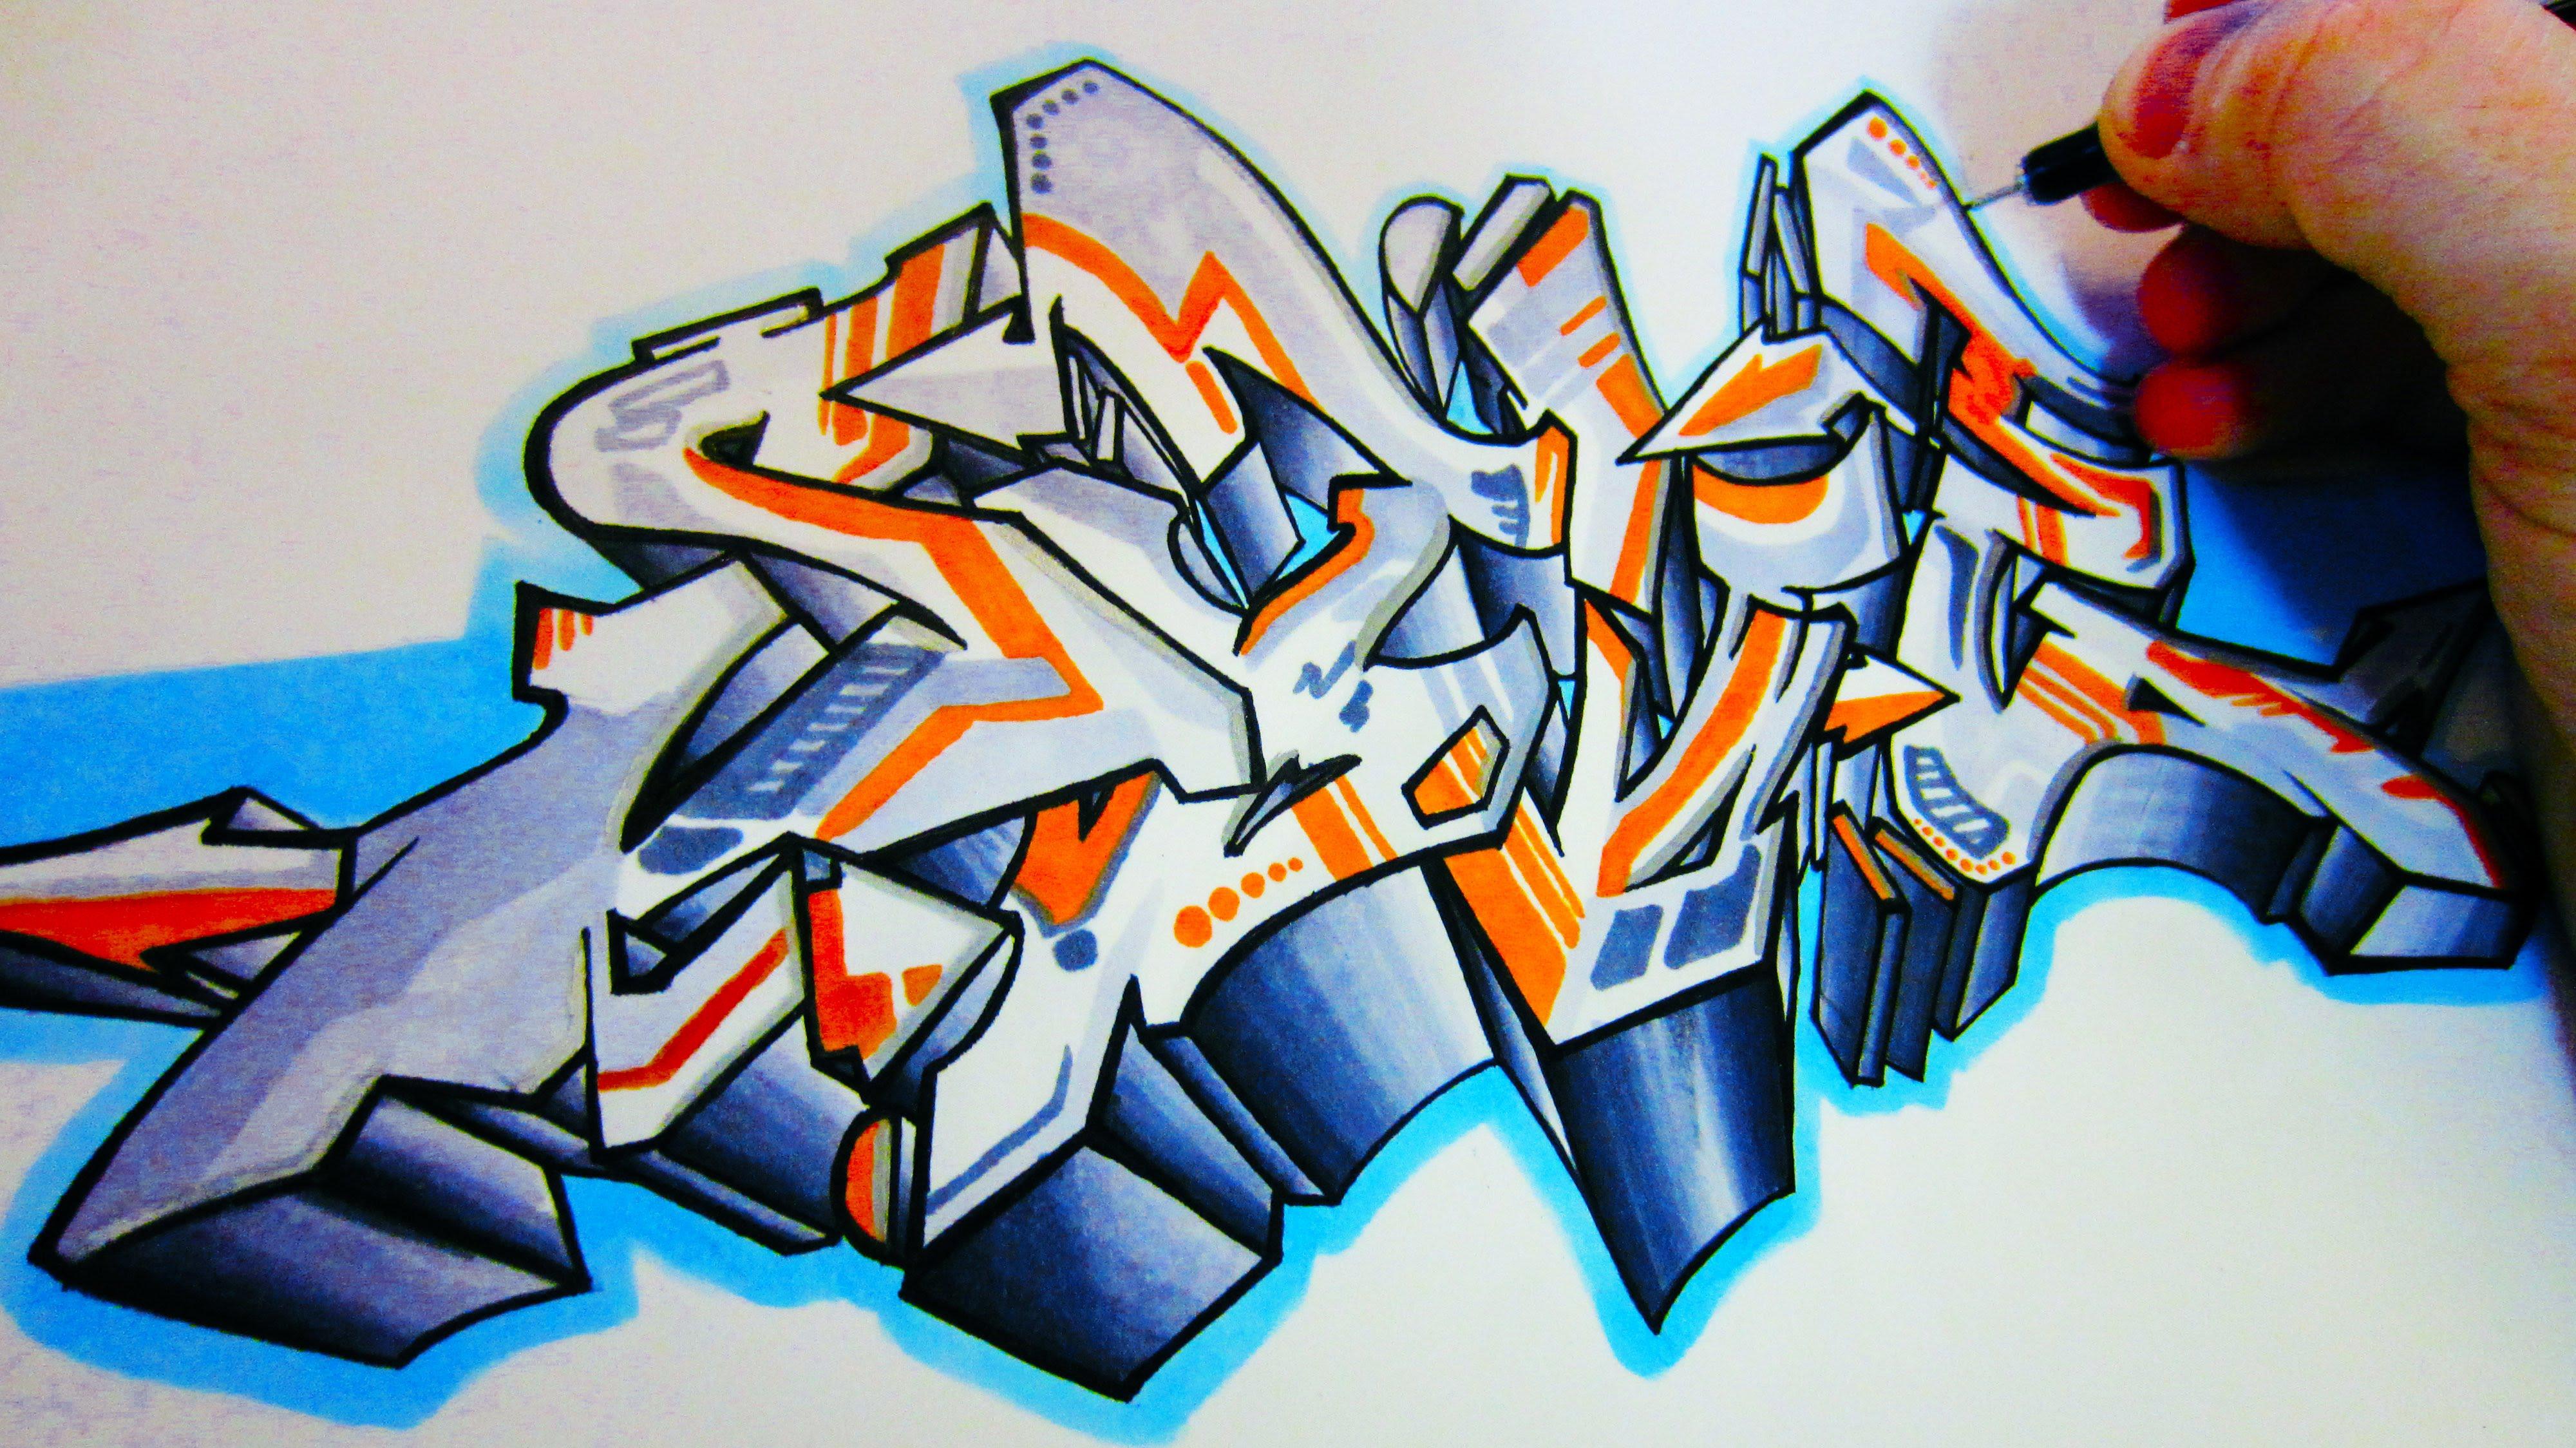 Images of Graffiti | 4000x2248